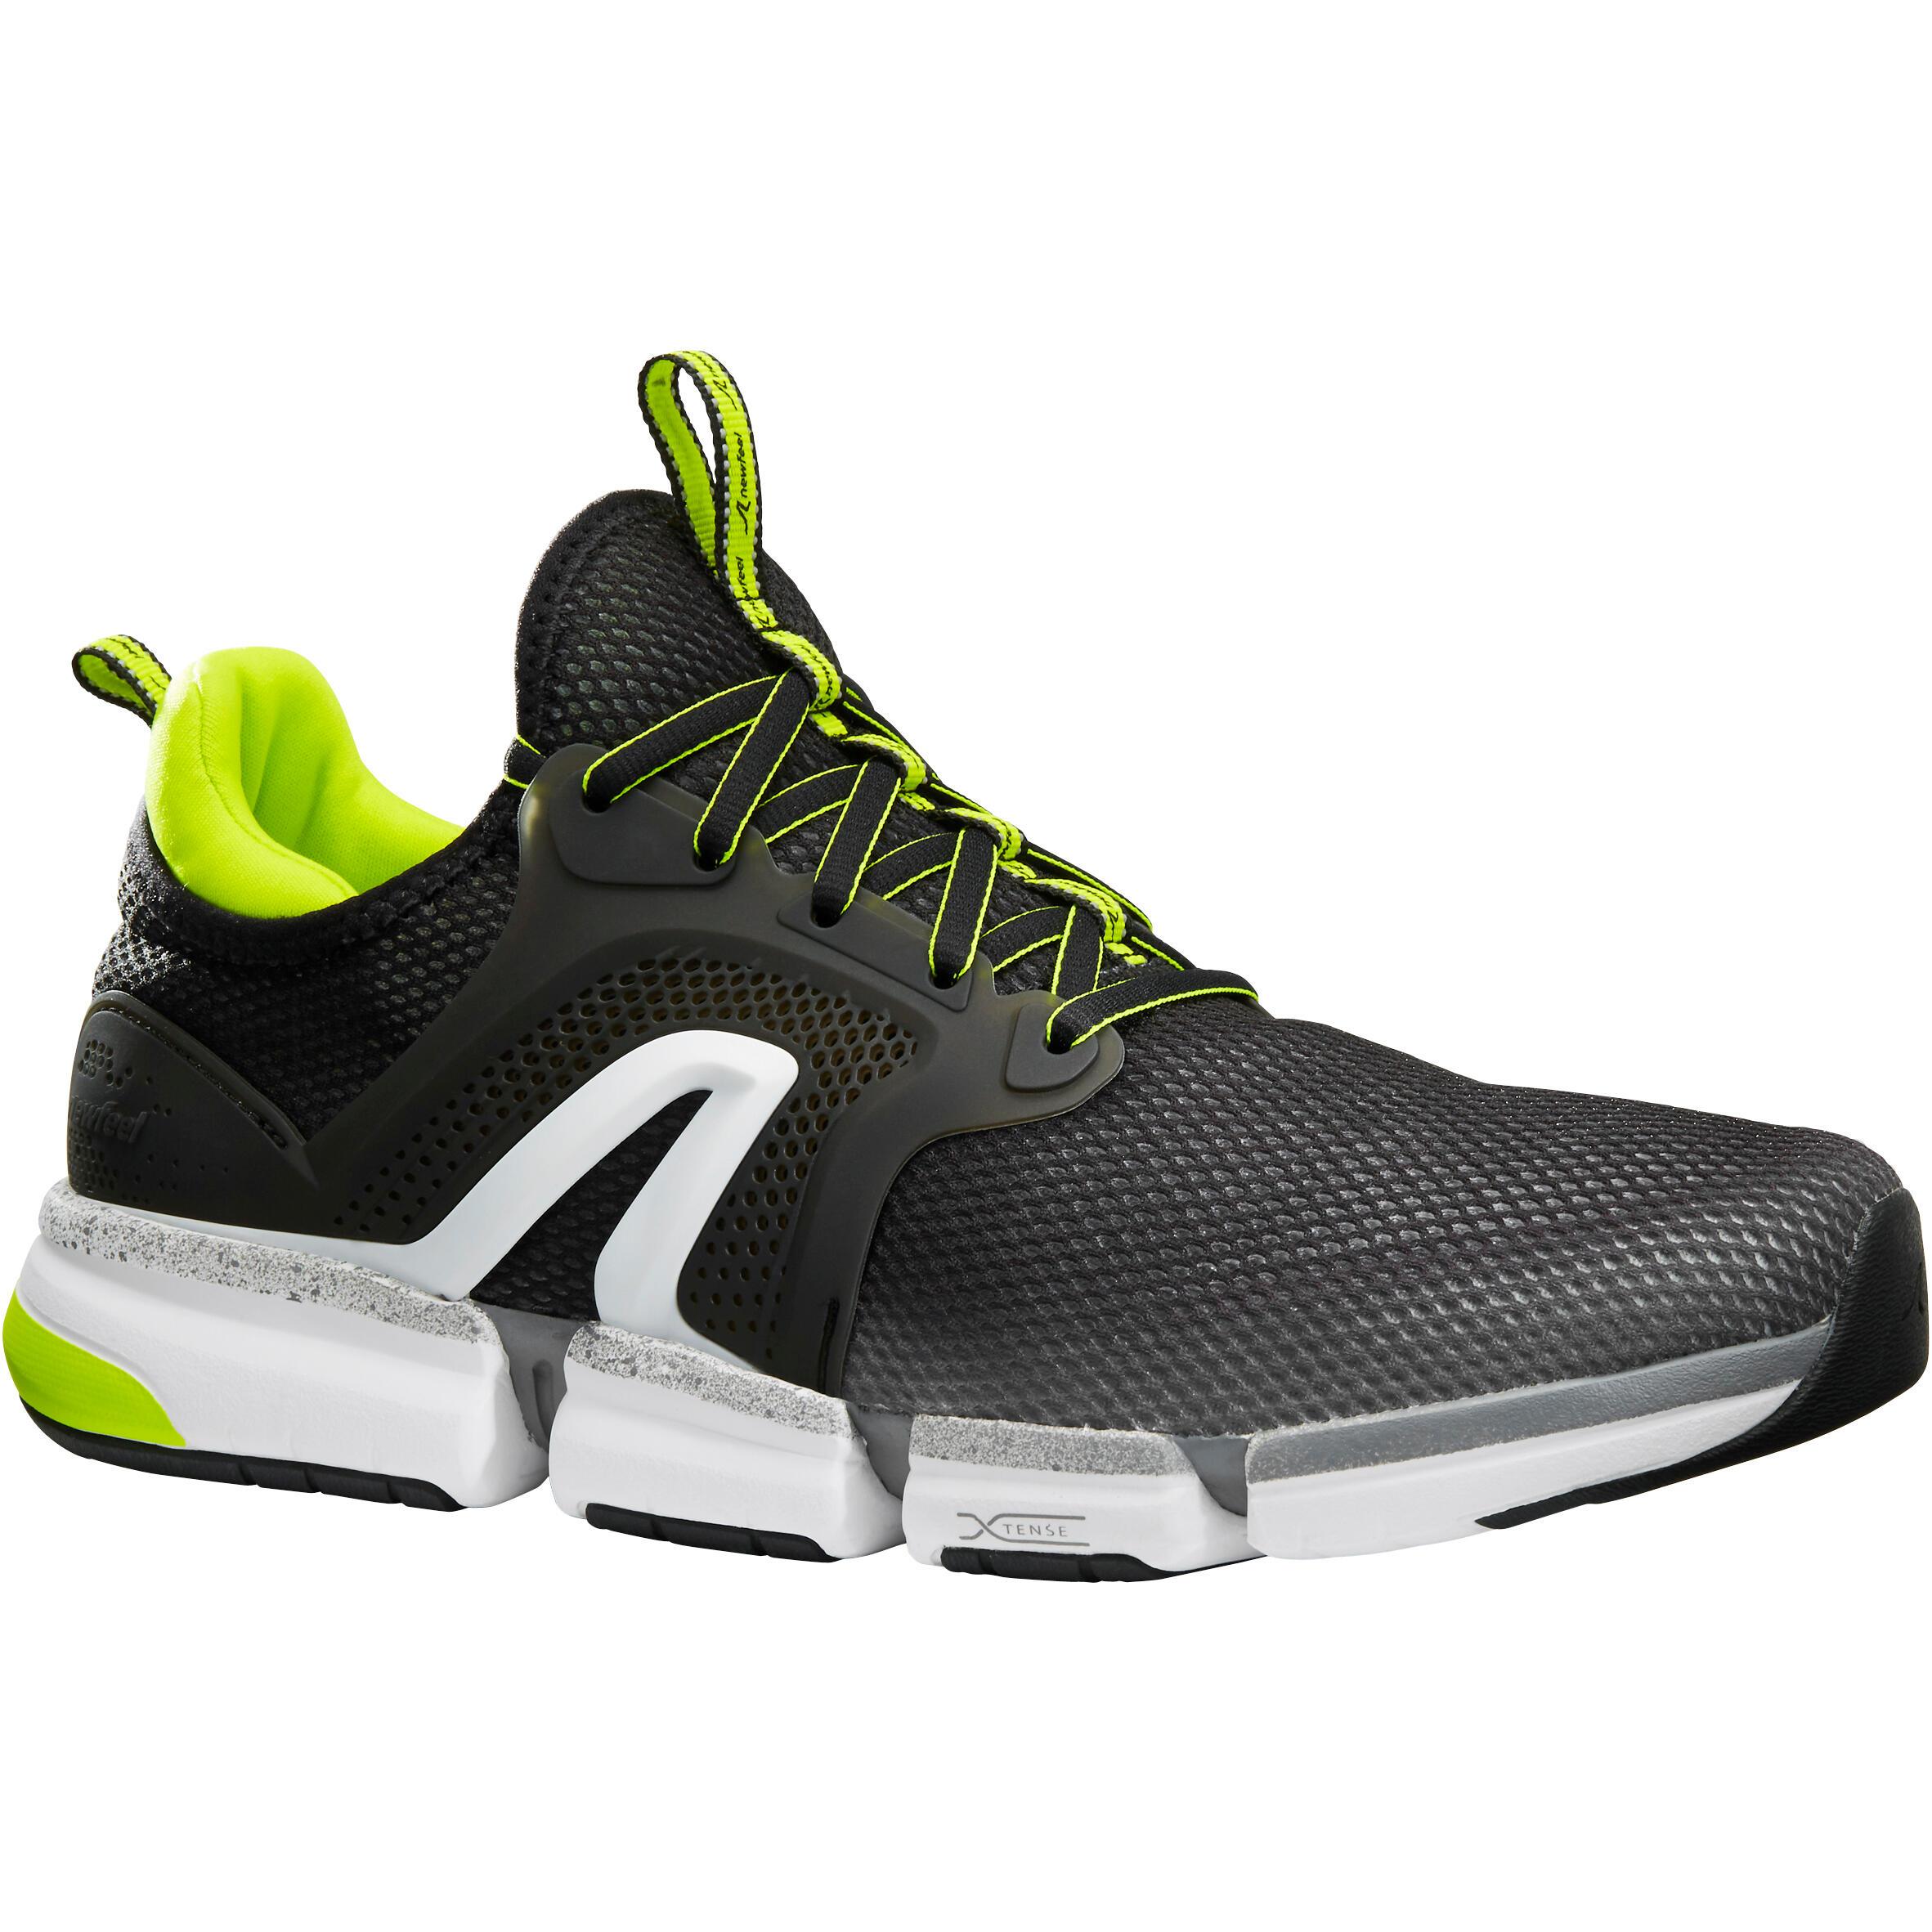 Newfeel Chaussures marche sportive homme PW 590 Xtense gris / jaune - Newfeel